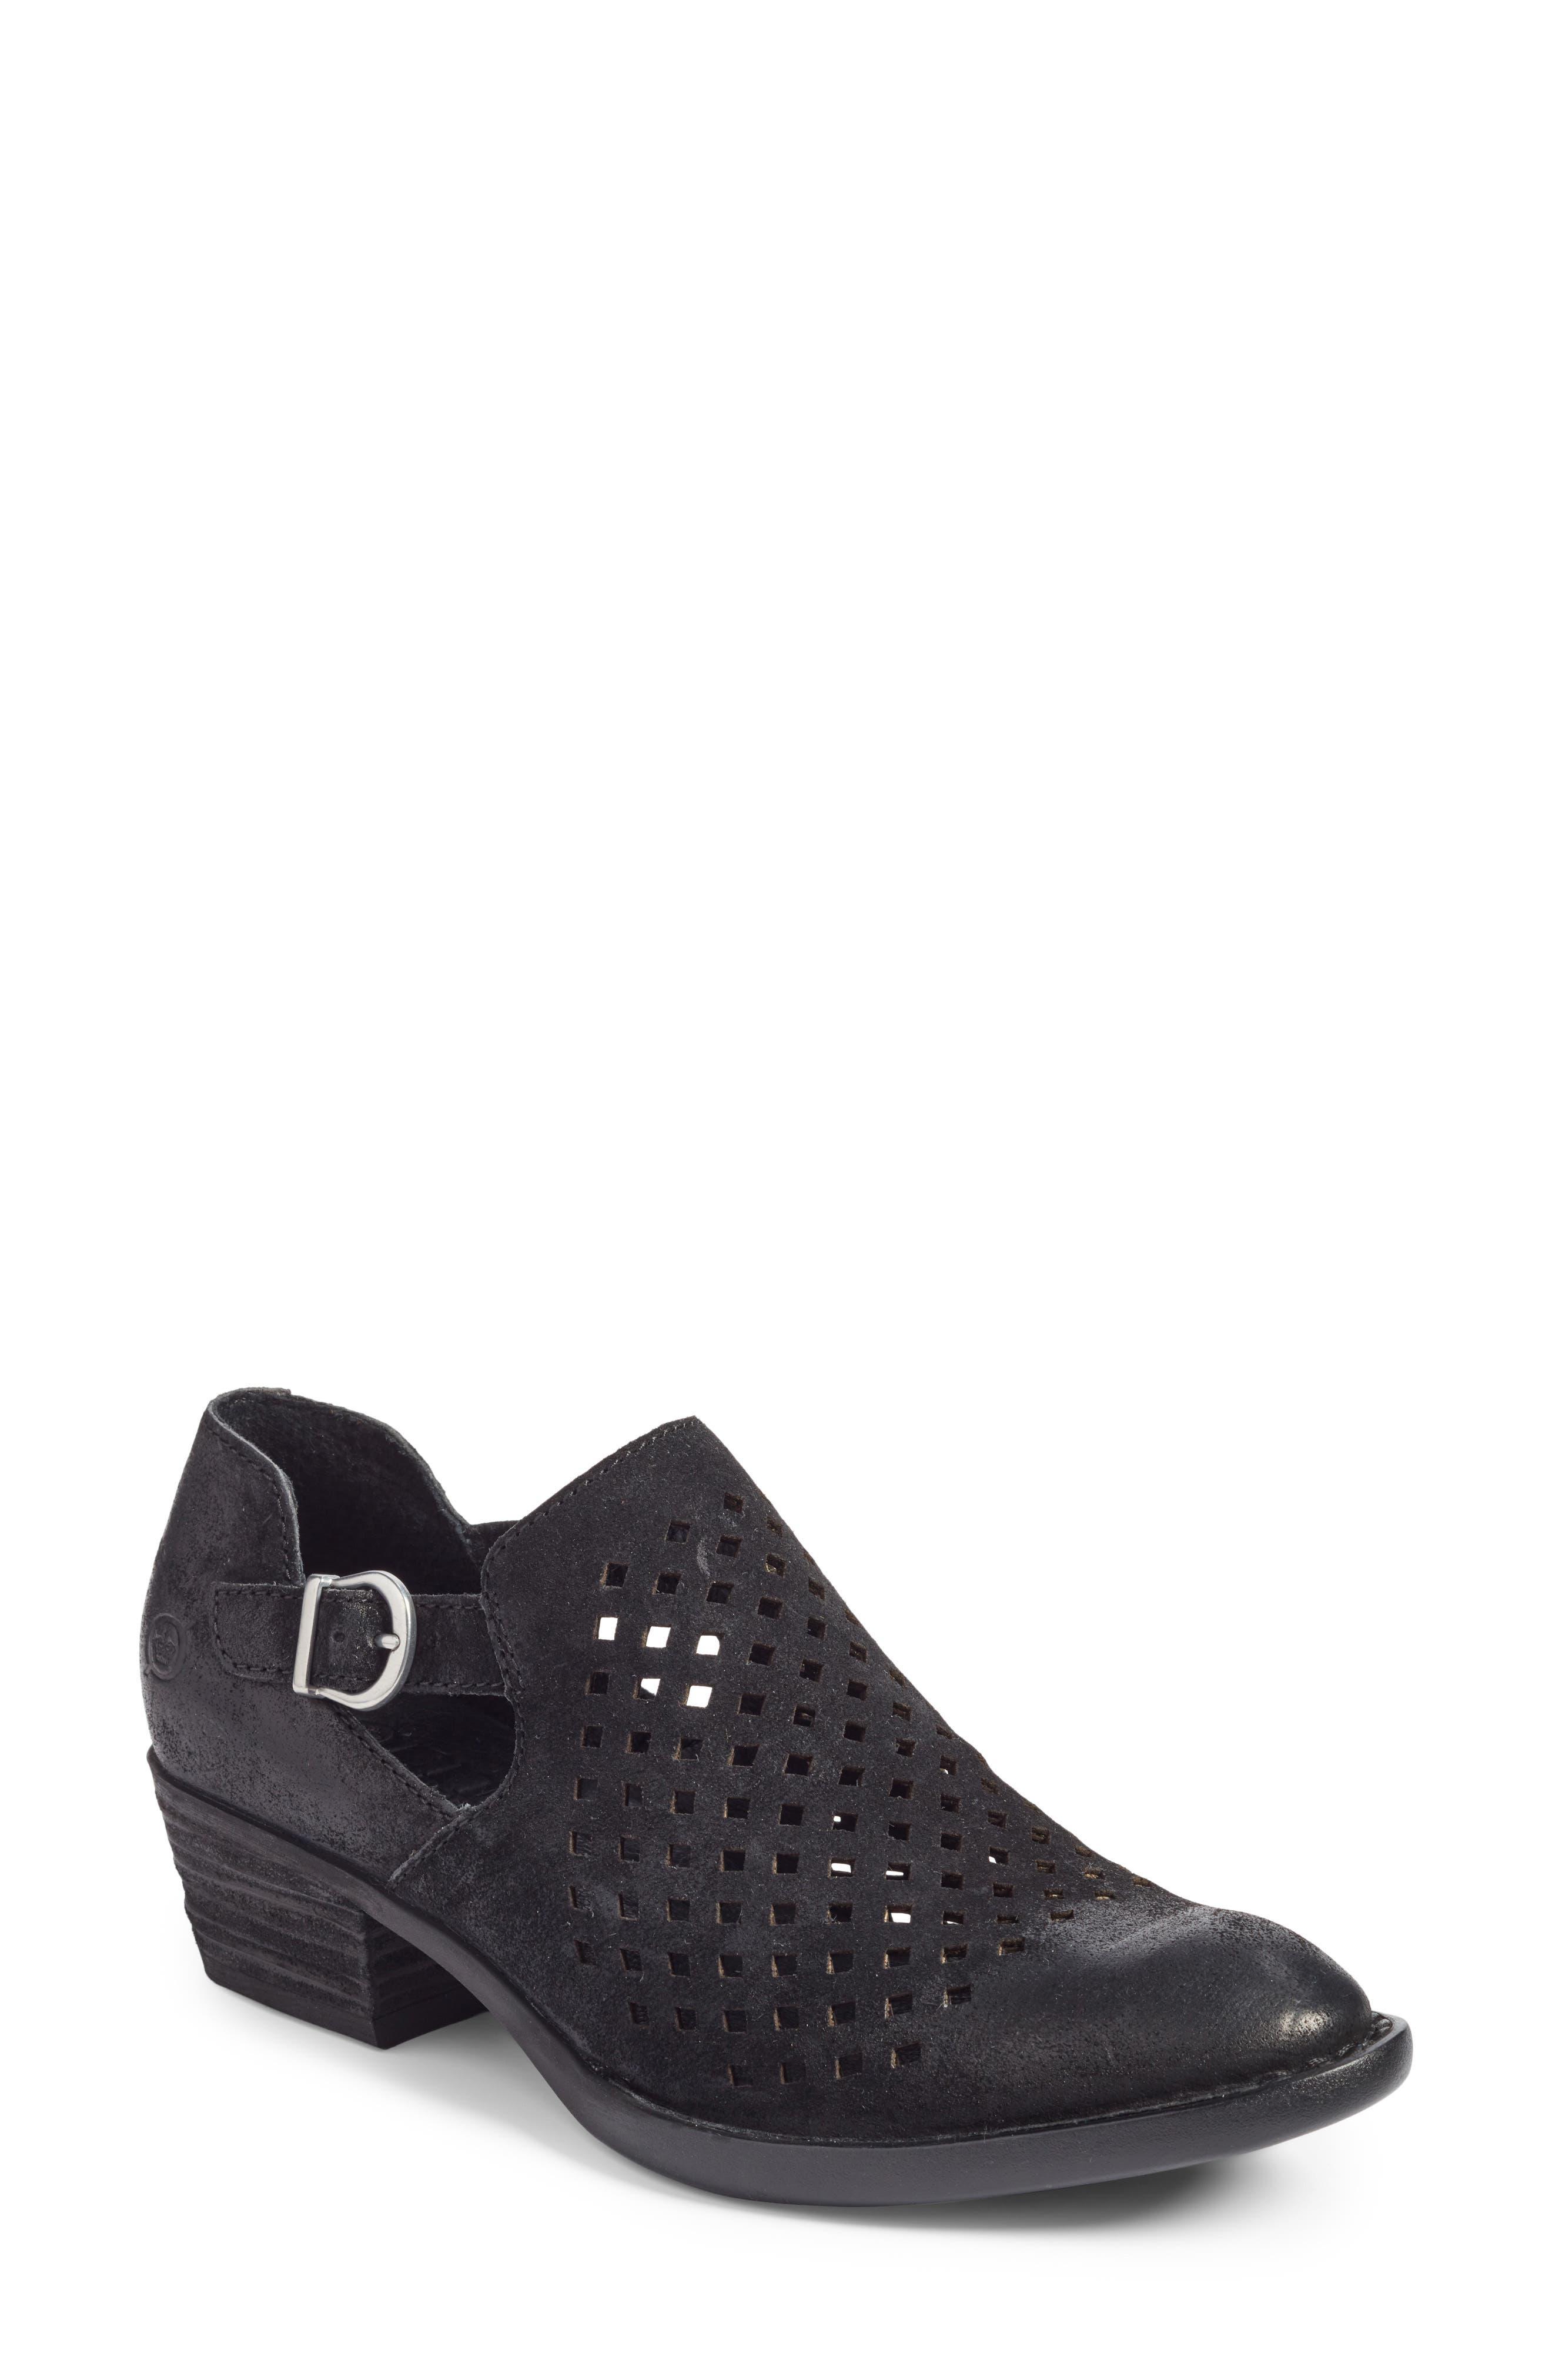 Nanna Bootie,                         Main,                         color, Black Leather